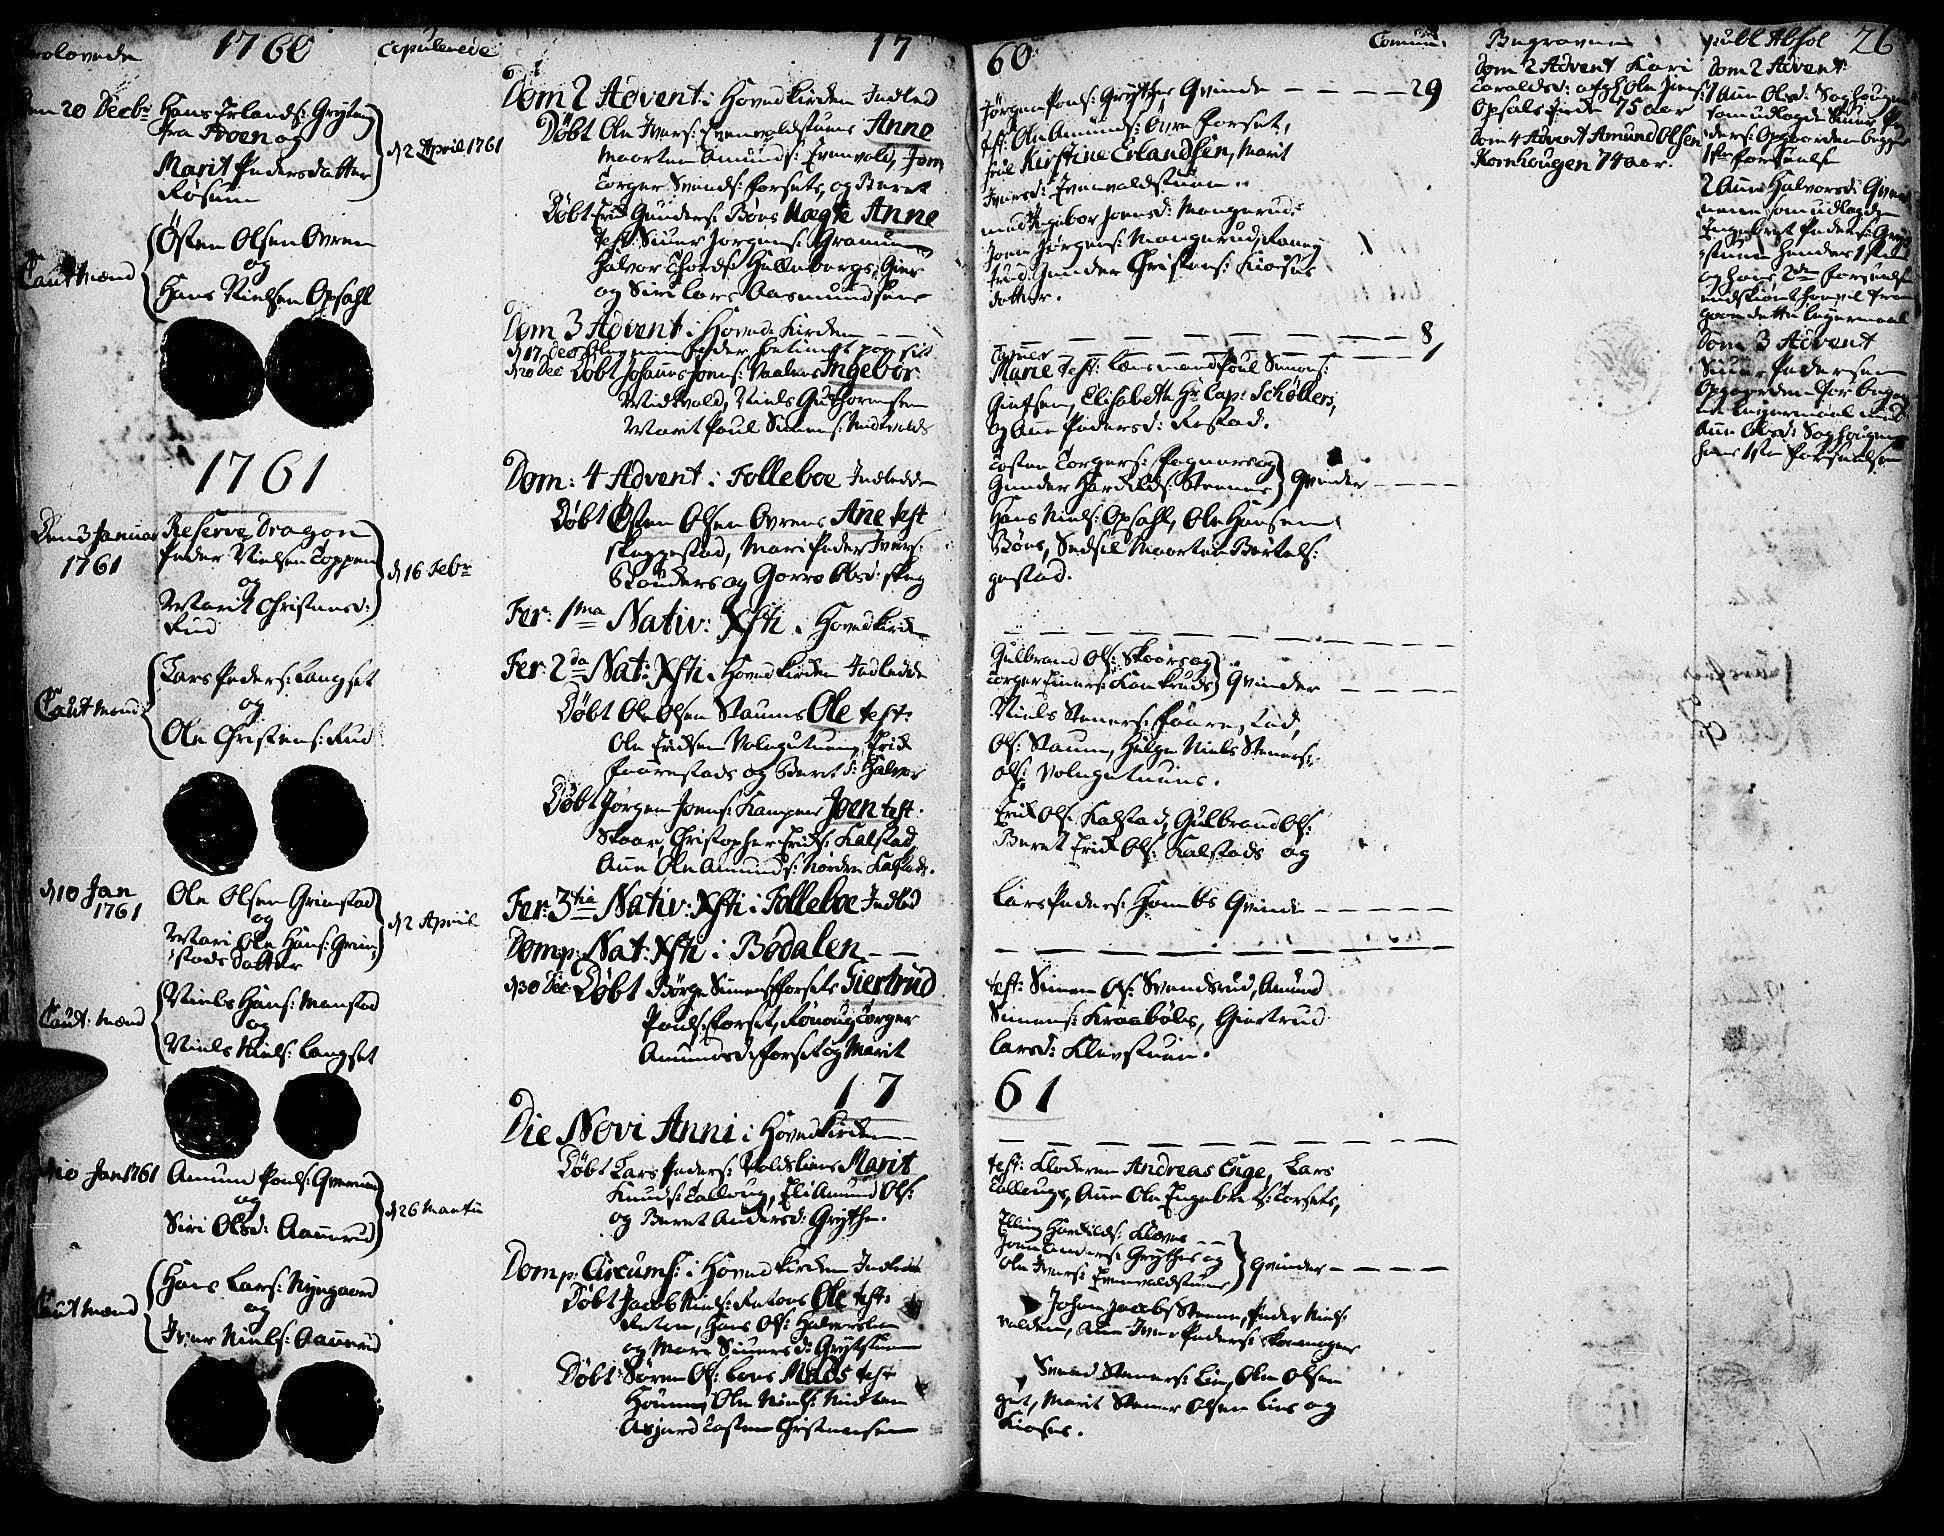 SAH, Gausdal prestekontor, Ministerialbok nr. 3, 1758-1809, s. 26